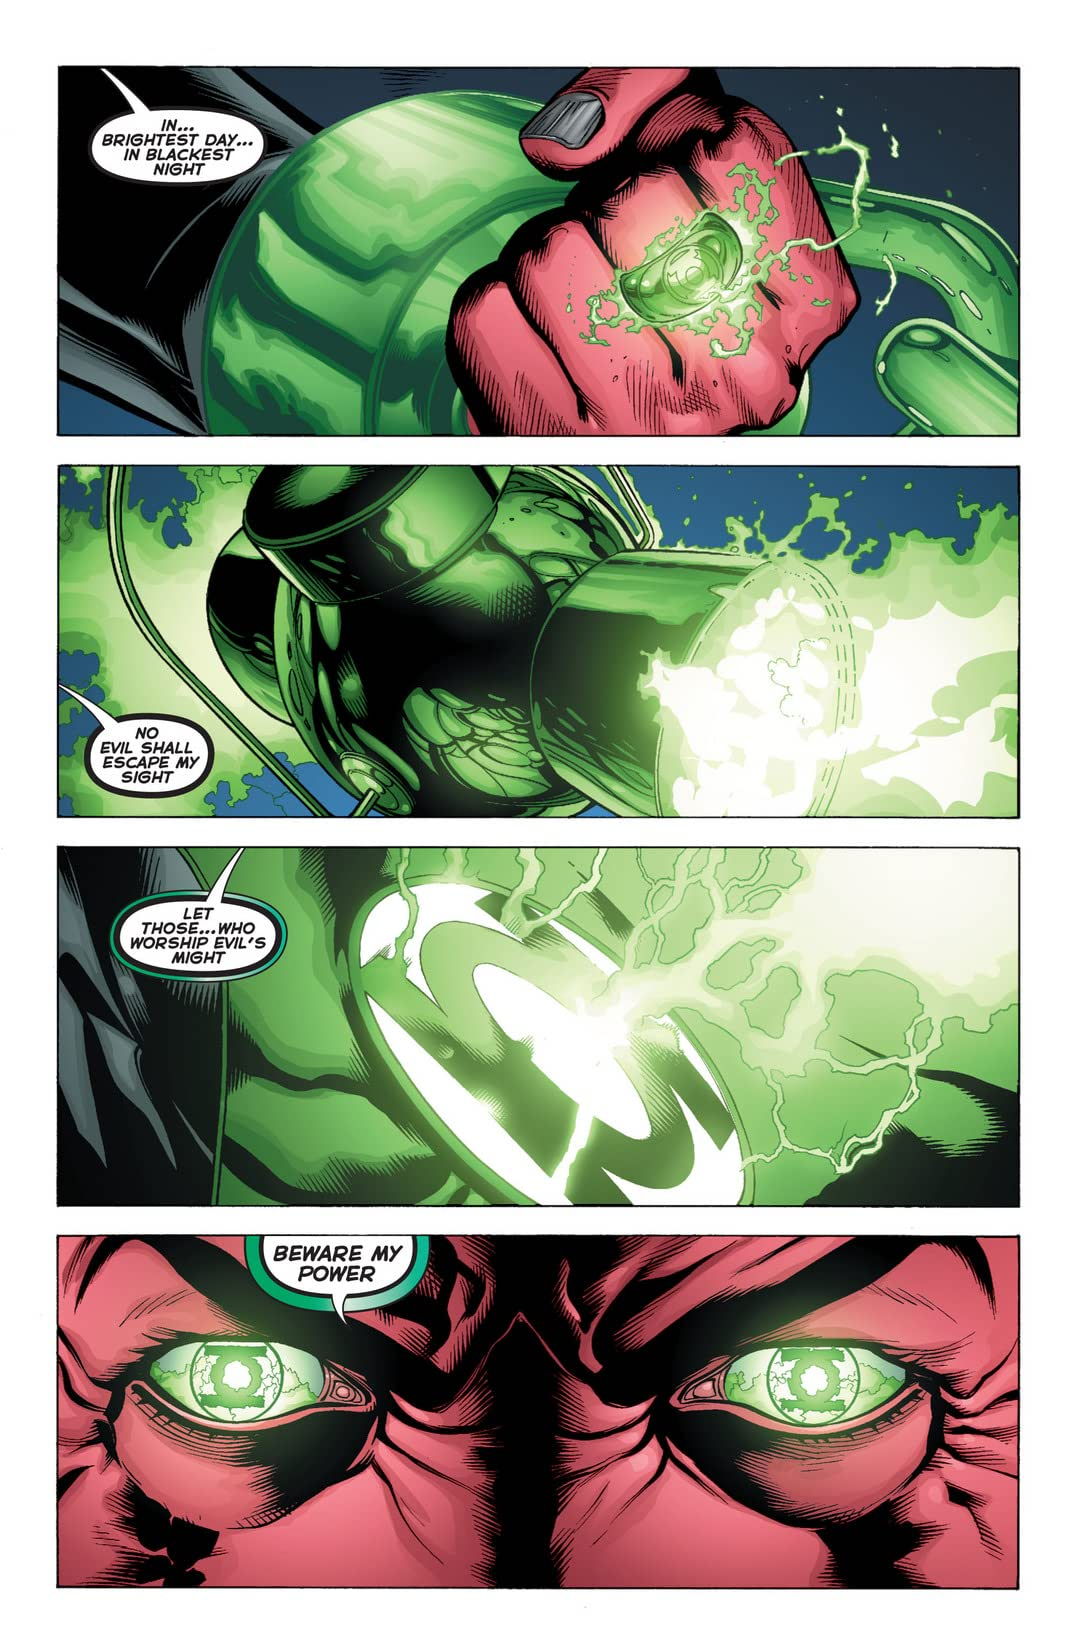 Green Lantern (2011-2016) Vol. 1: Sinestro